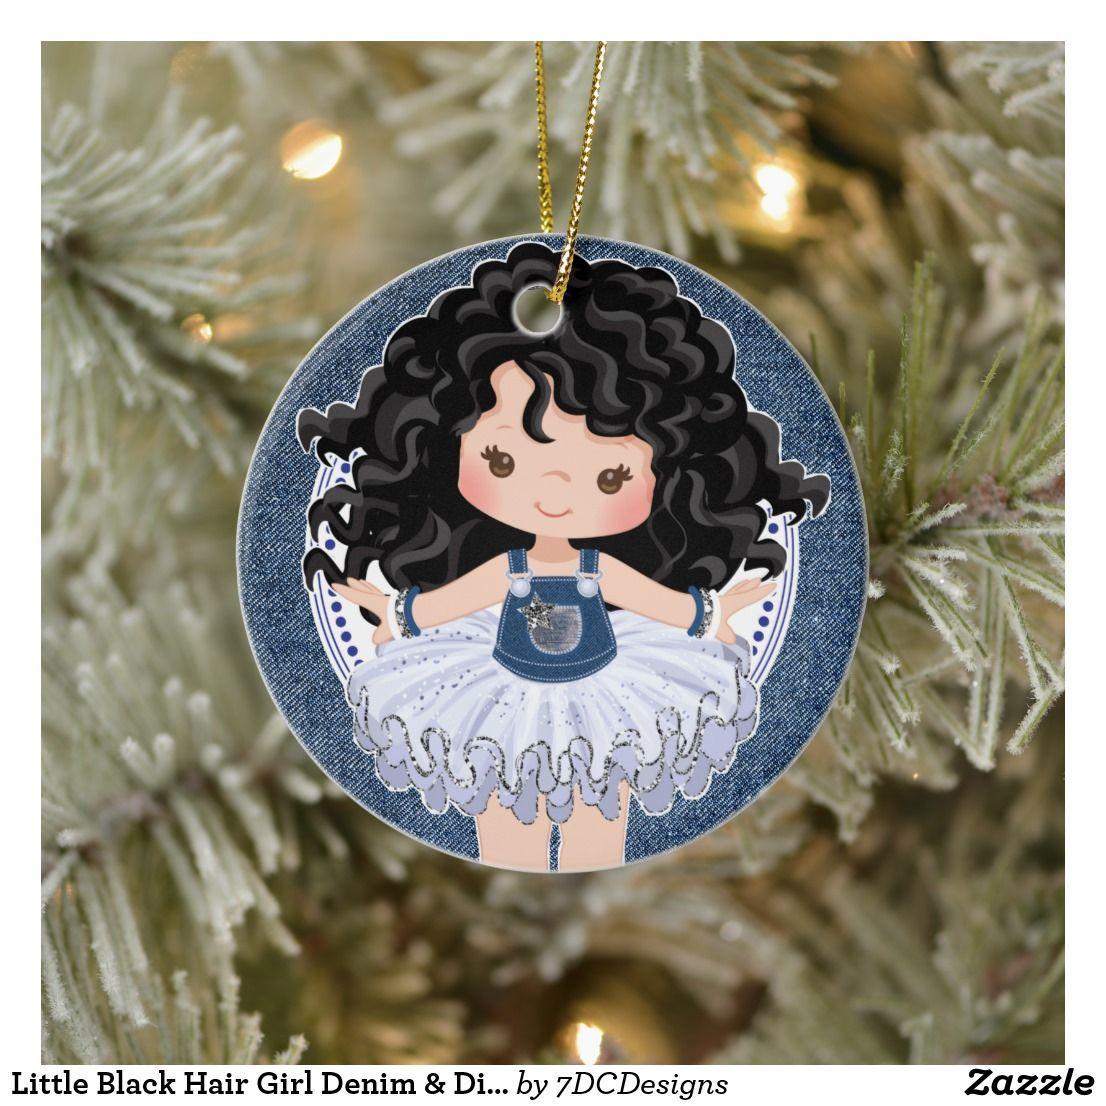 Little Black Hair Girl Denim & Diamonds Christmas Ceramic Ornament | Zazzle.com